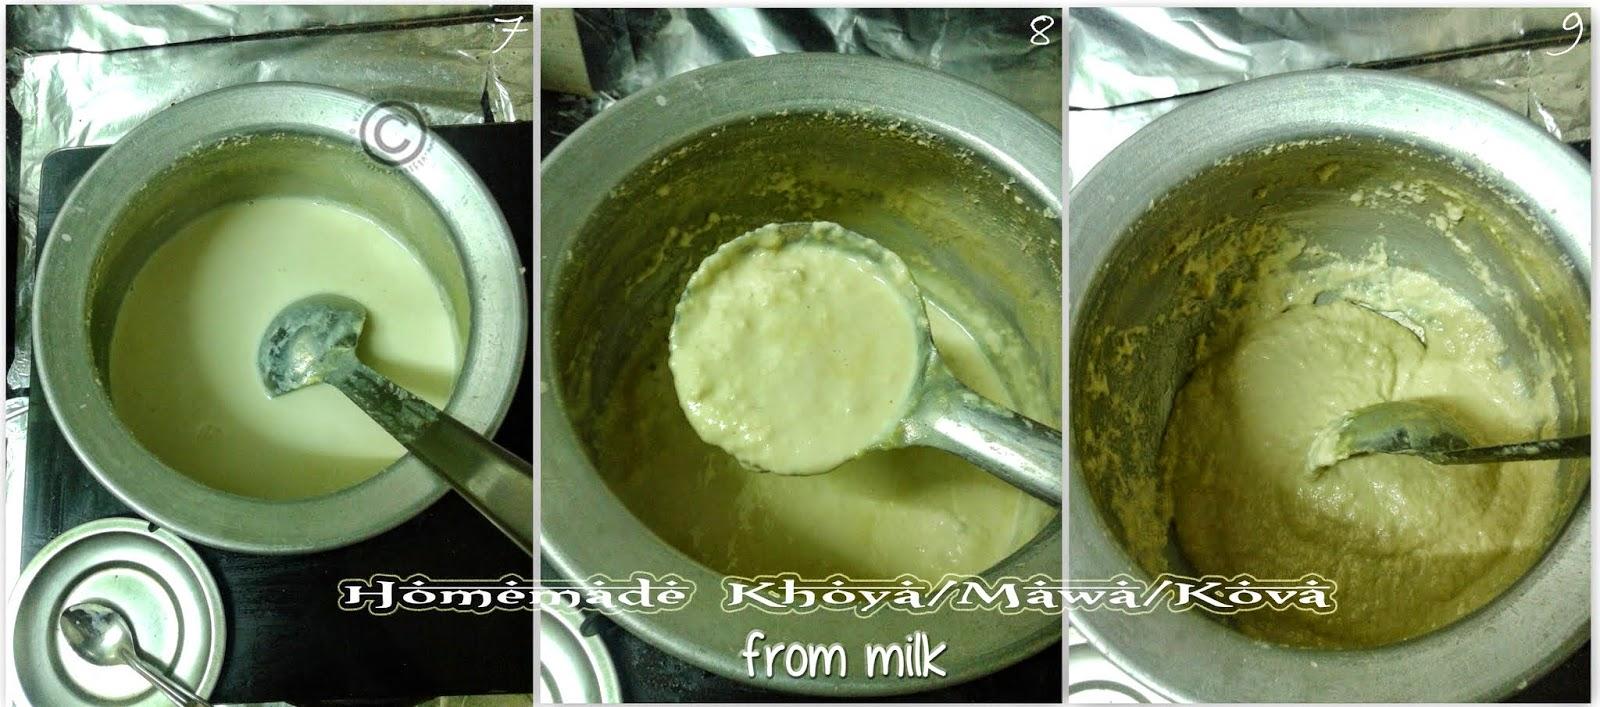 fresh-mawa-from-milk